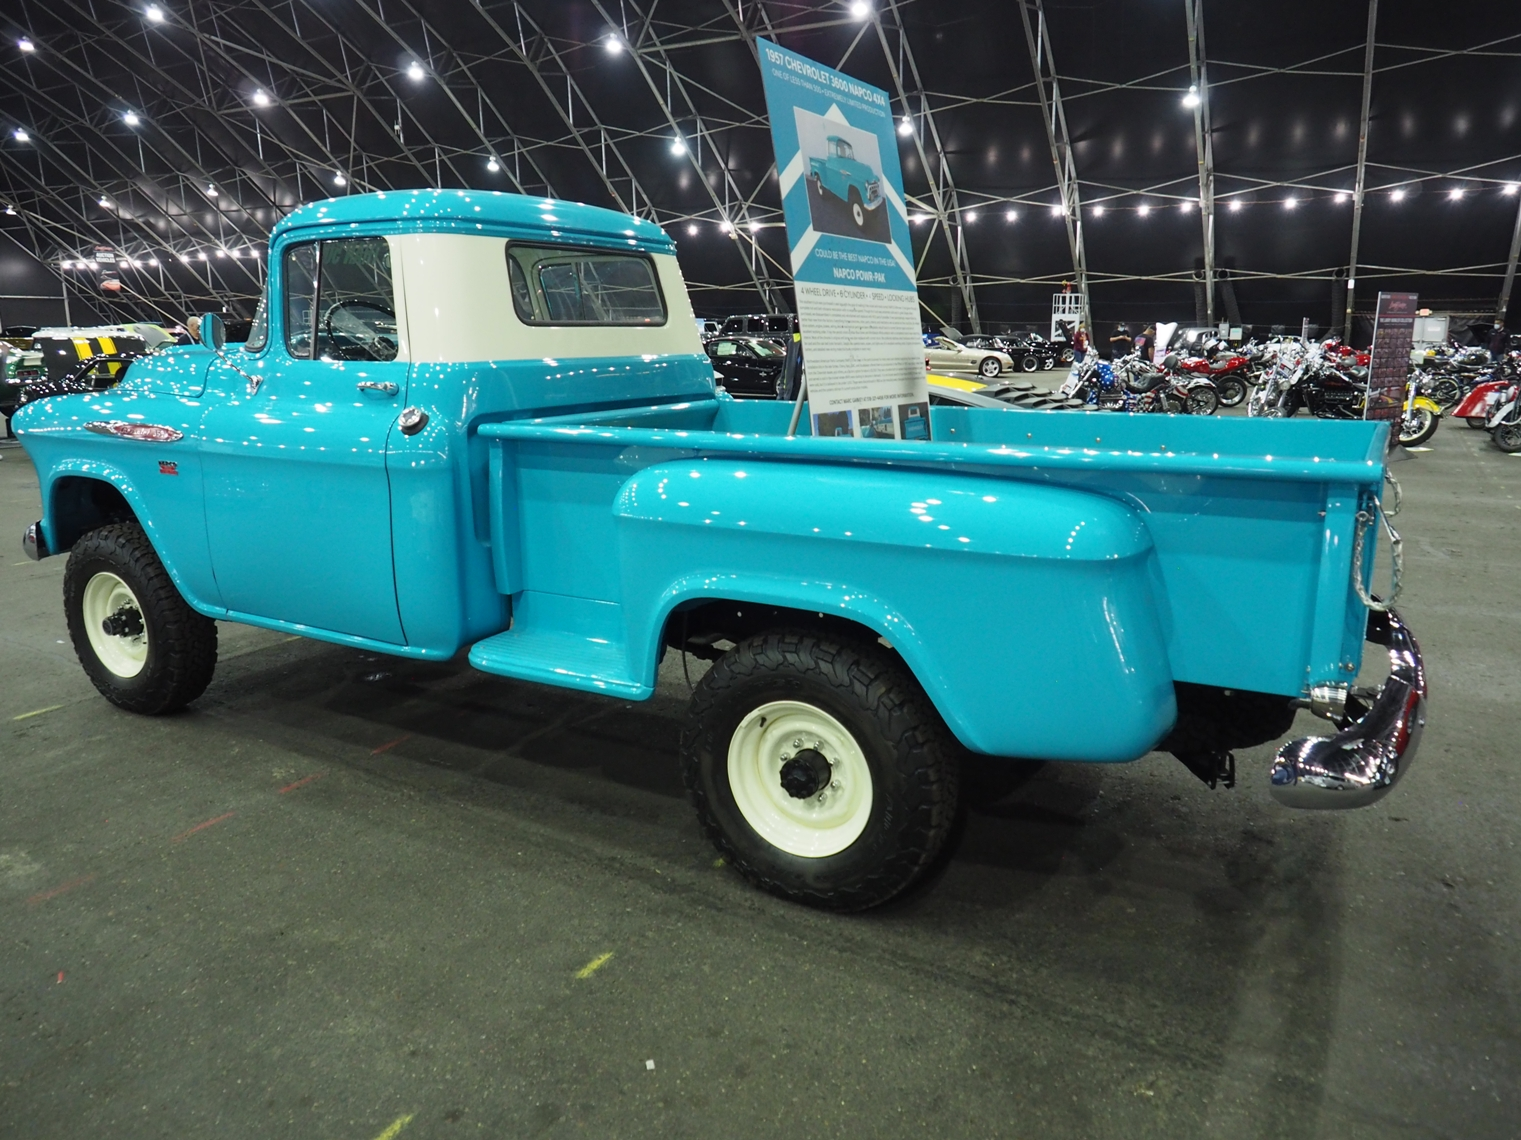 NAPCO 4x4 conversion kit equipped GMC truck